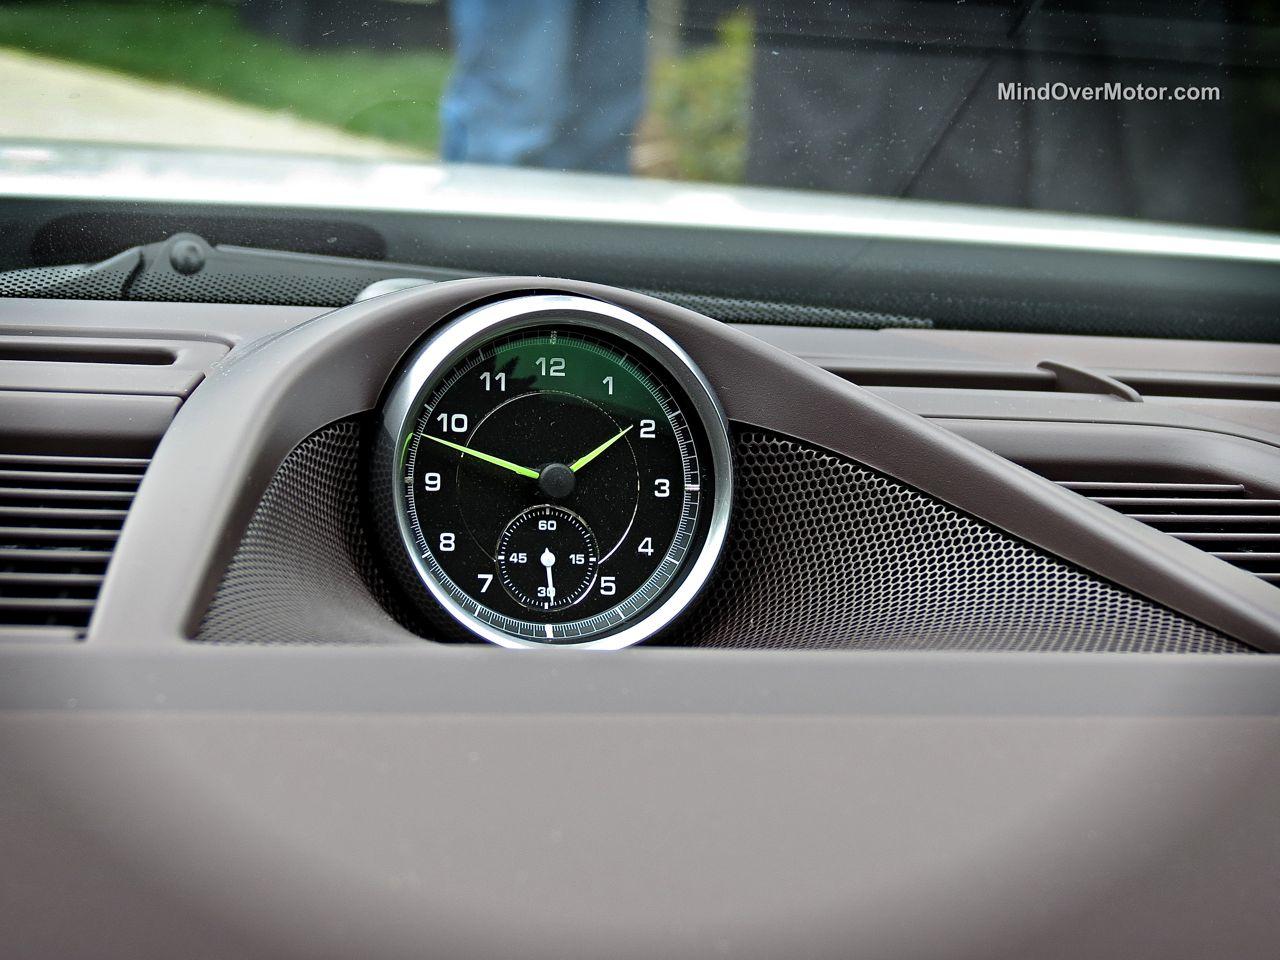 Porsche Panamera S E-Hybrid Sport Chrono Clock